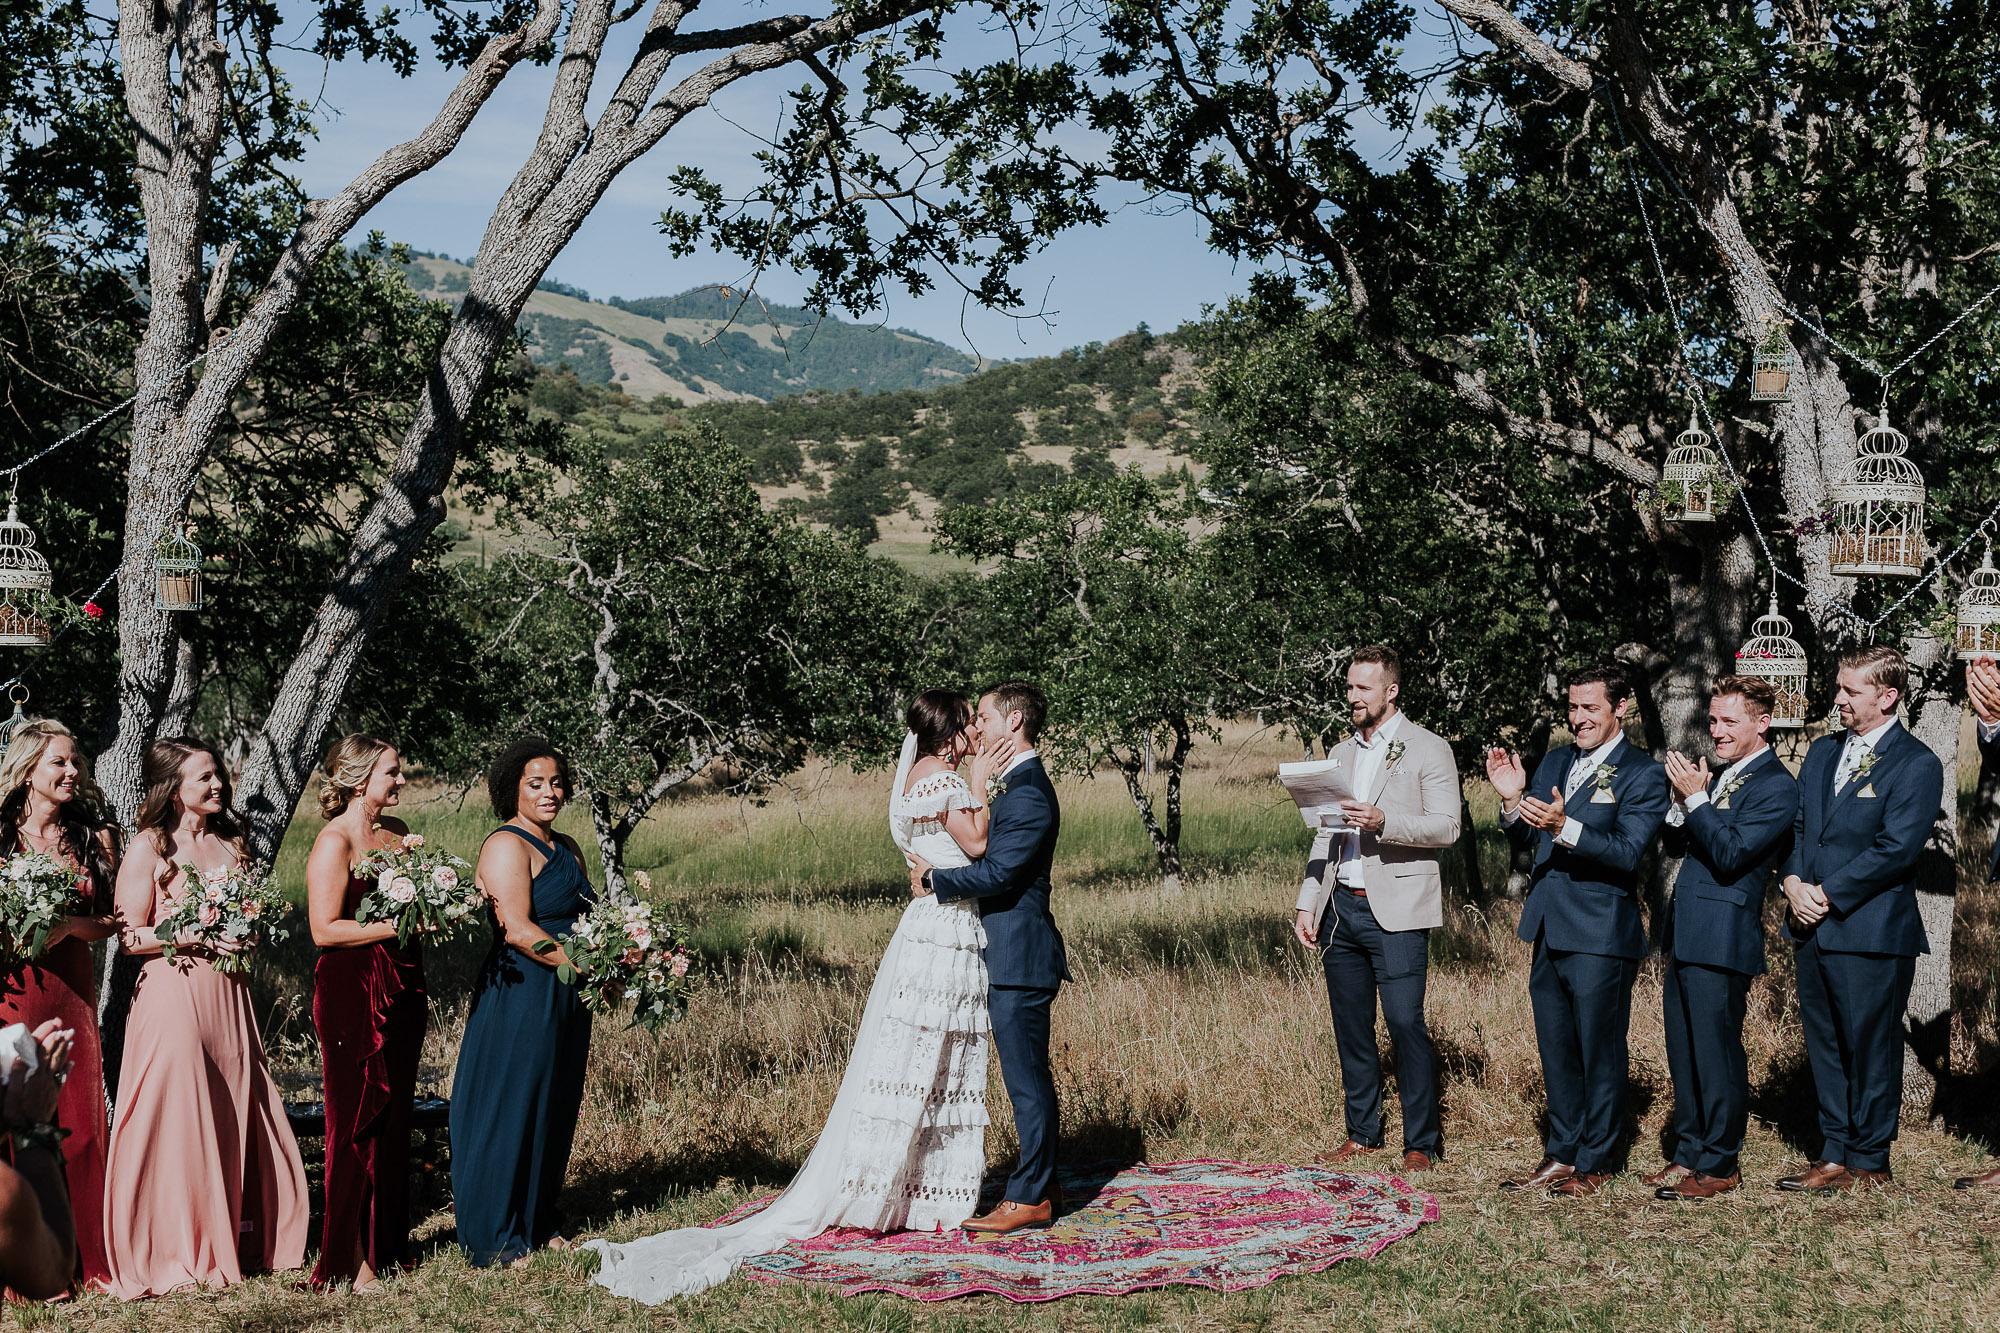 outdoor wedding photographer emily hary